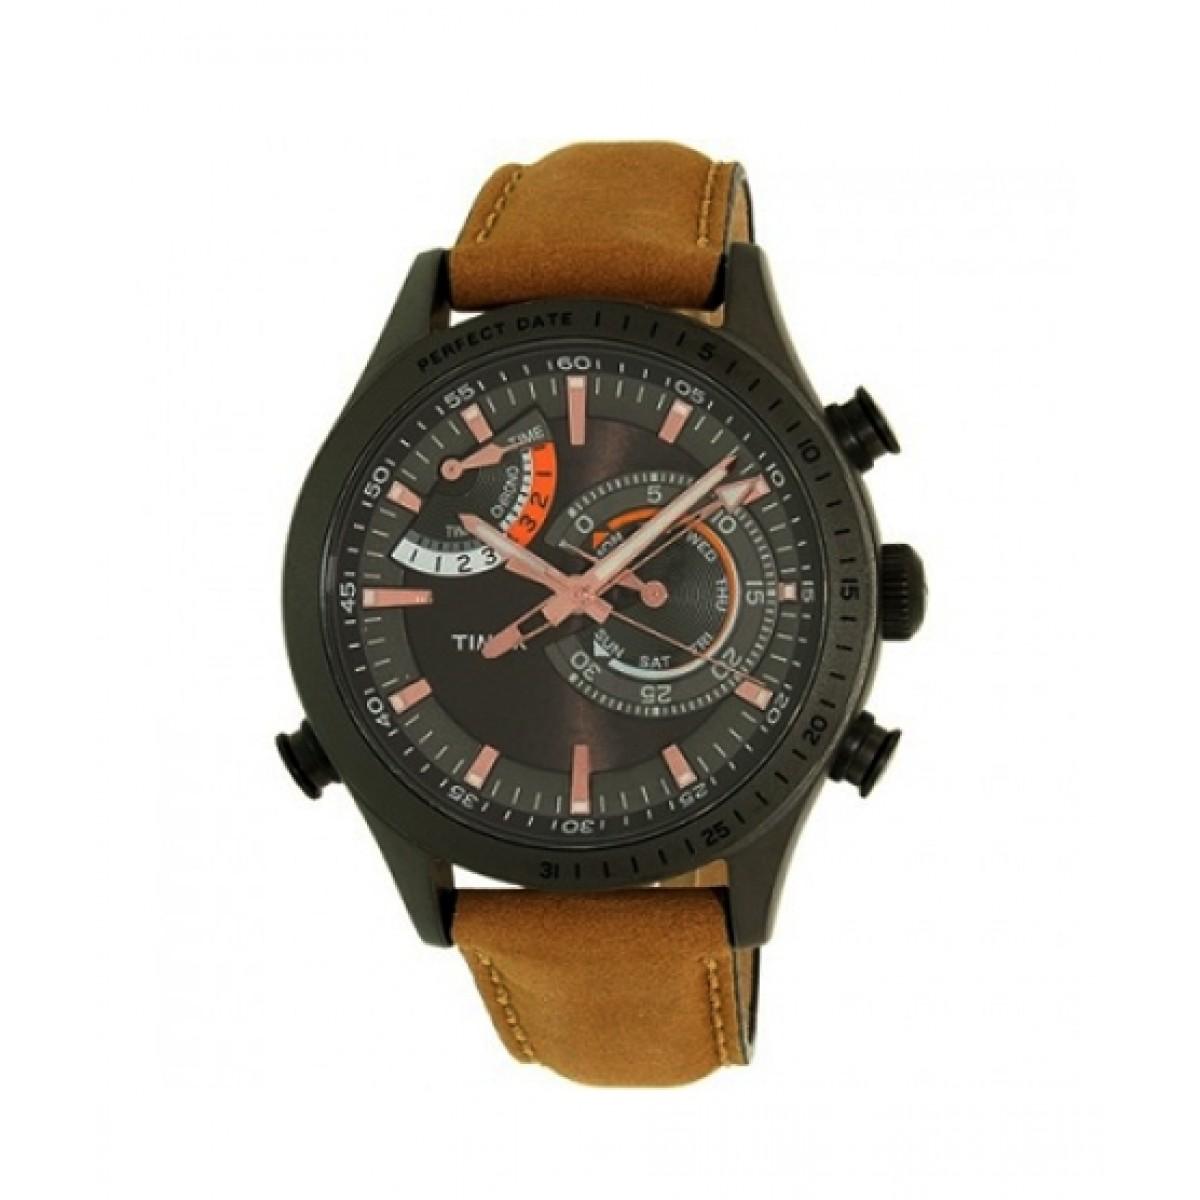 ba3da7c4b Timex Men's Watch Price in Pakistan   Buy Timex Intelligent Quartz Chrono Leather  Band Men's Watch (TW2P72500DH)   iShopping.pk